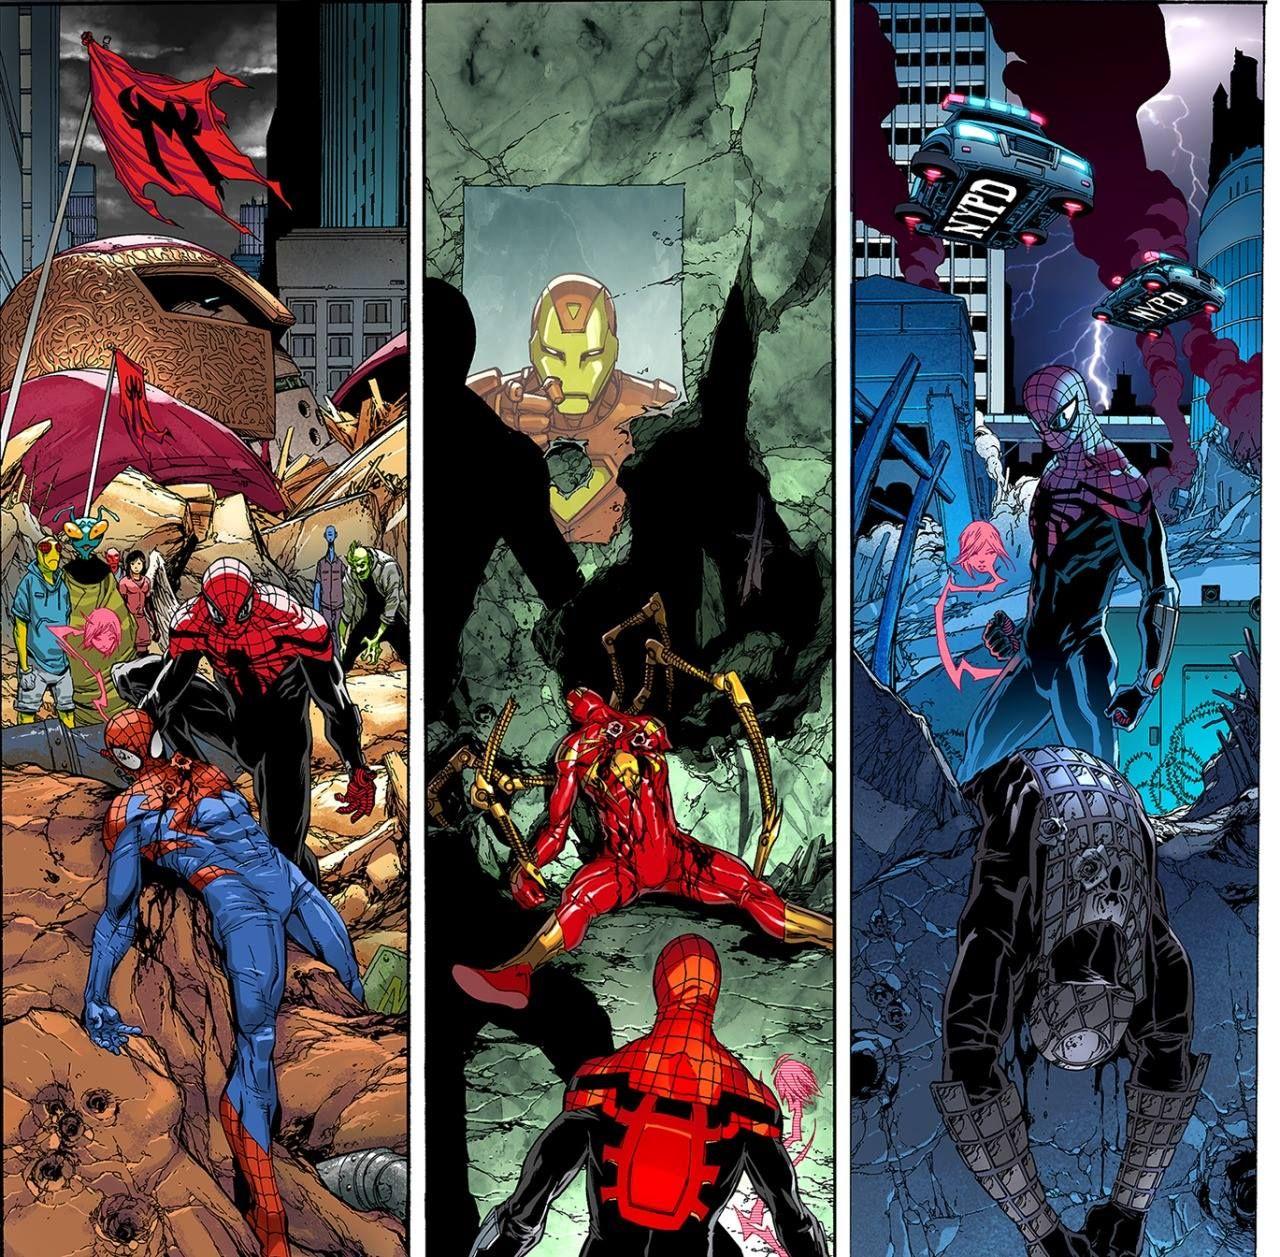 Superior Spider-Man #32 interior art by Giuseppe Camuncoli, John Dell, Antonio Fabela *